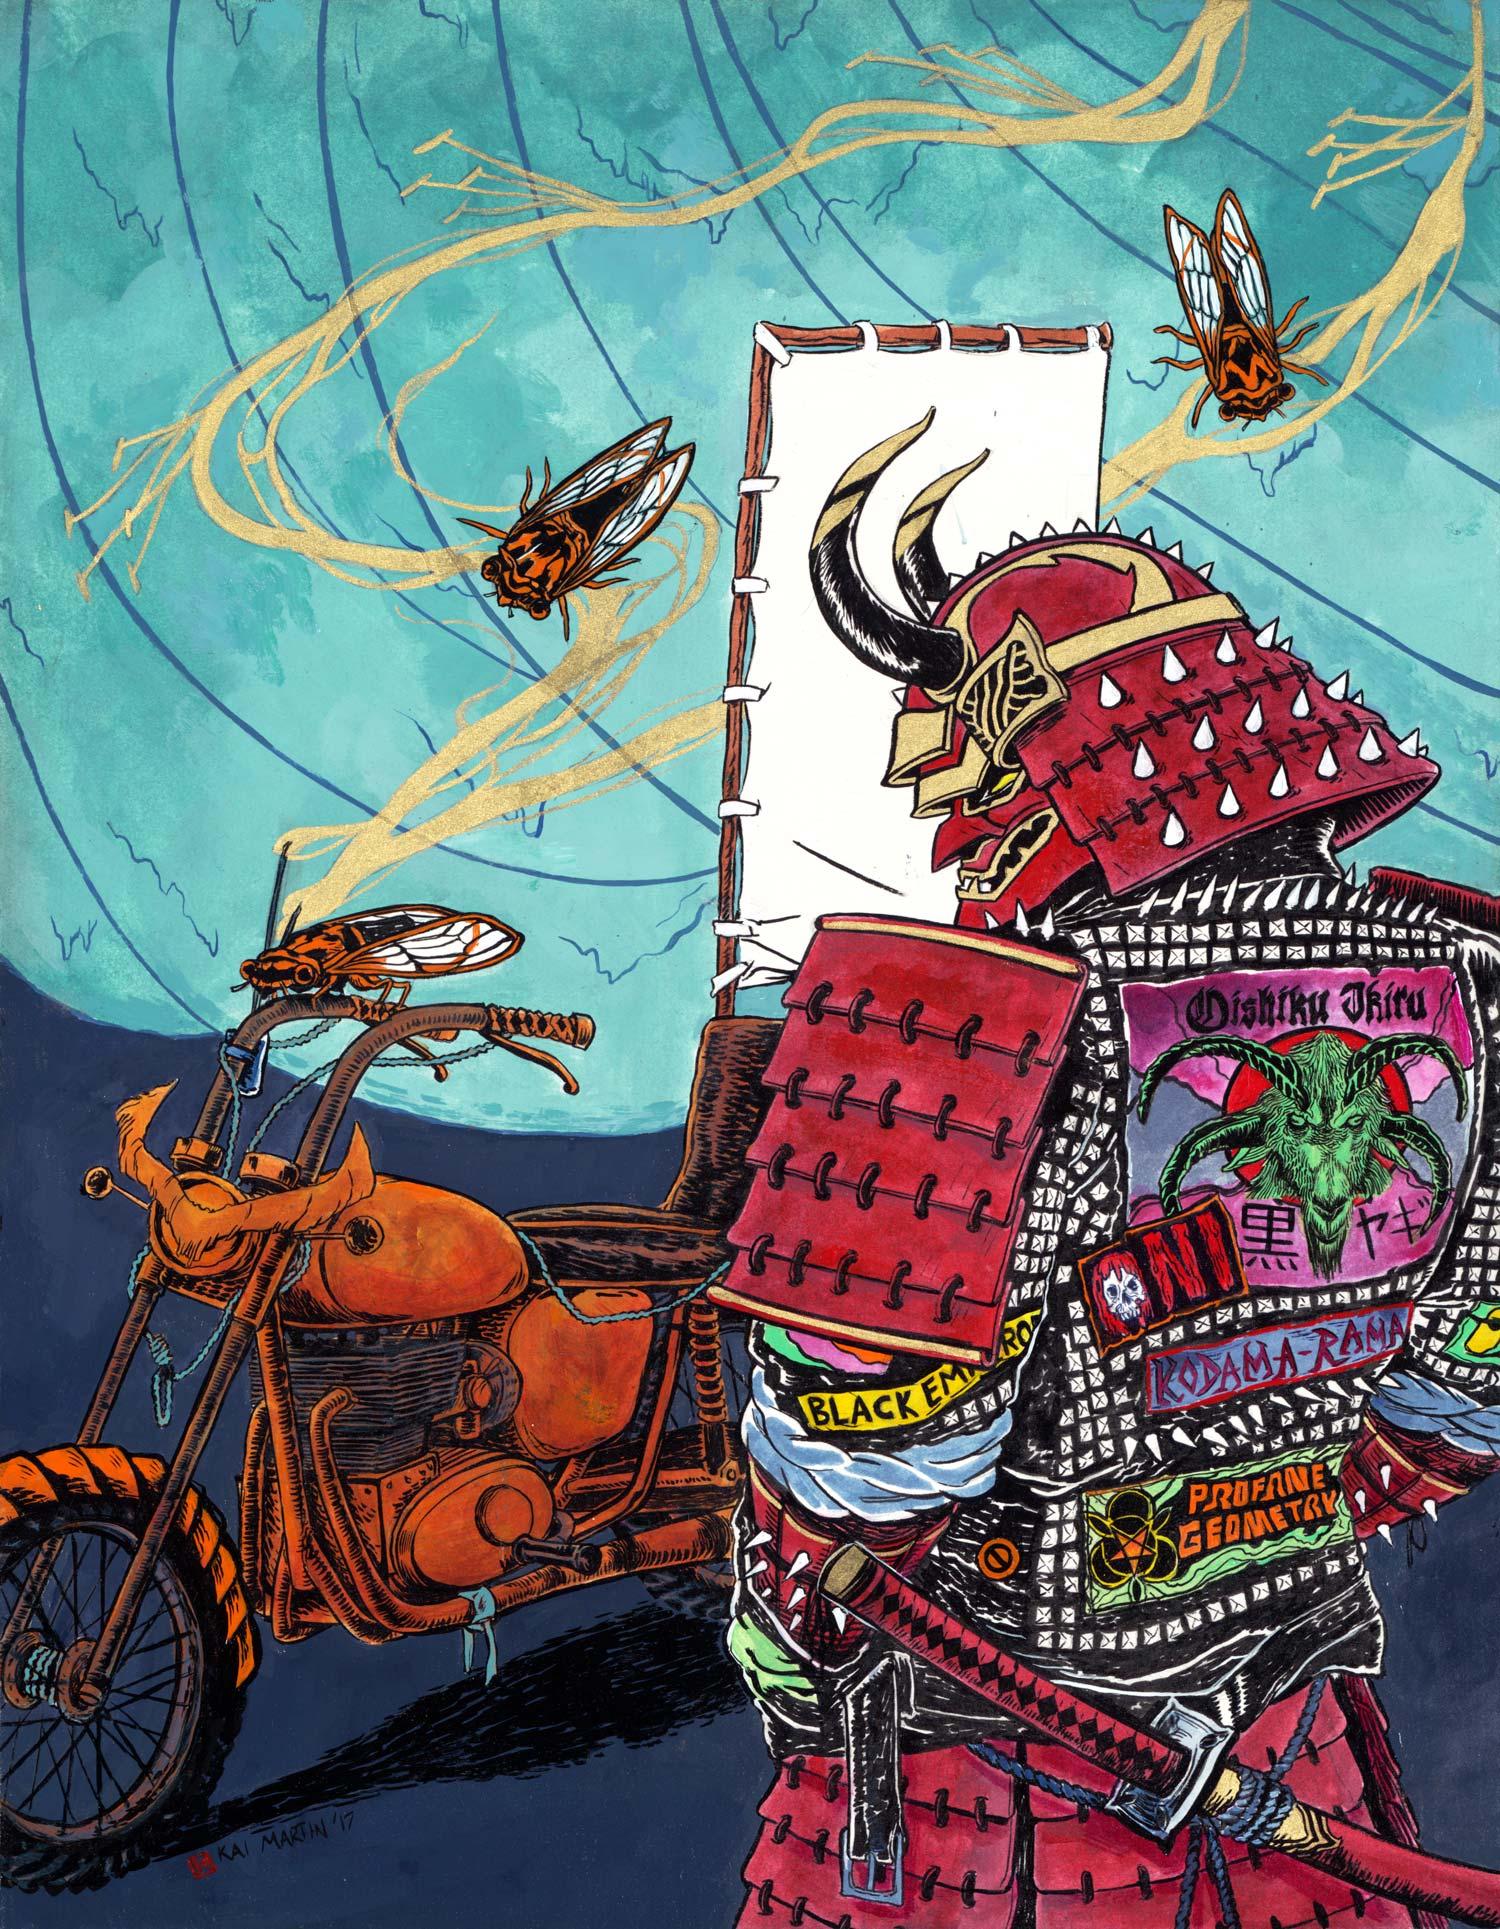 The Warlock  2017 - Ink & Acrylic on Birch Cradled Paper